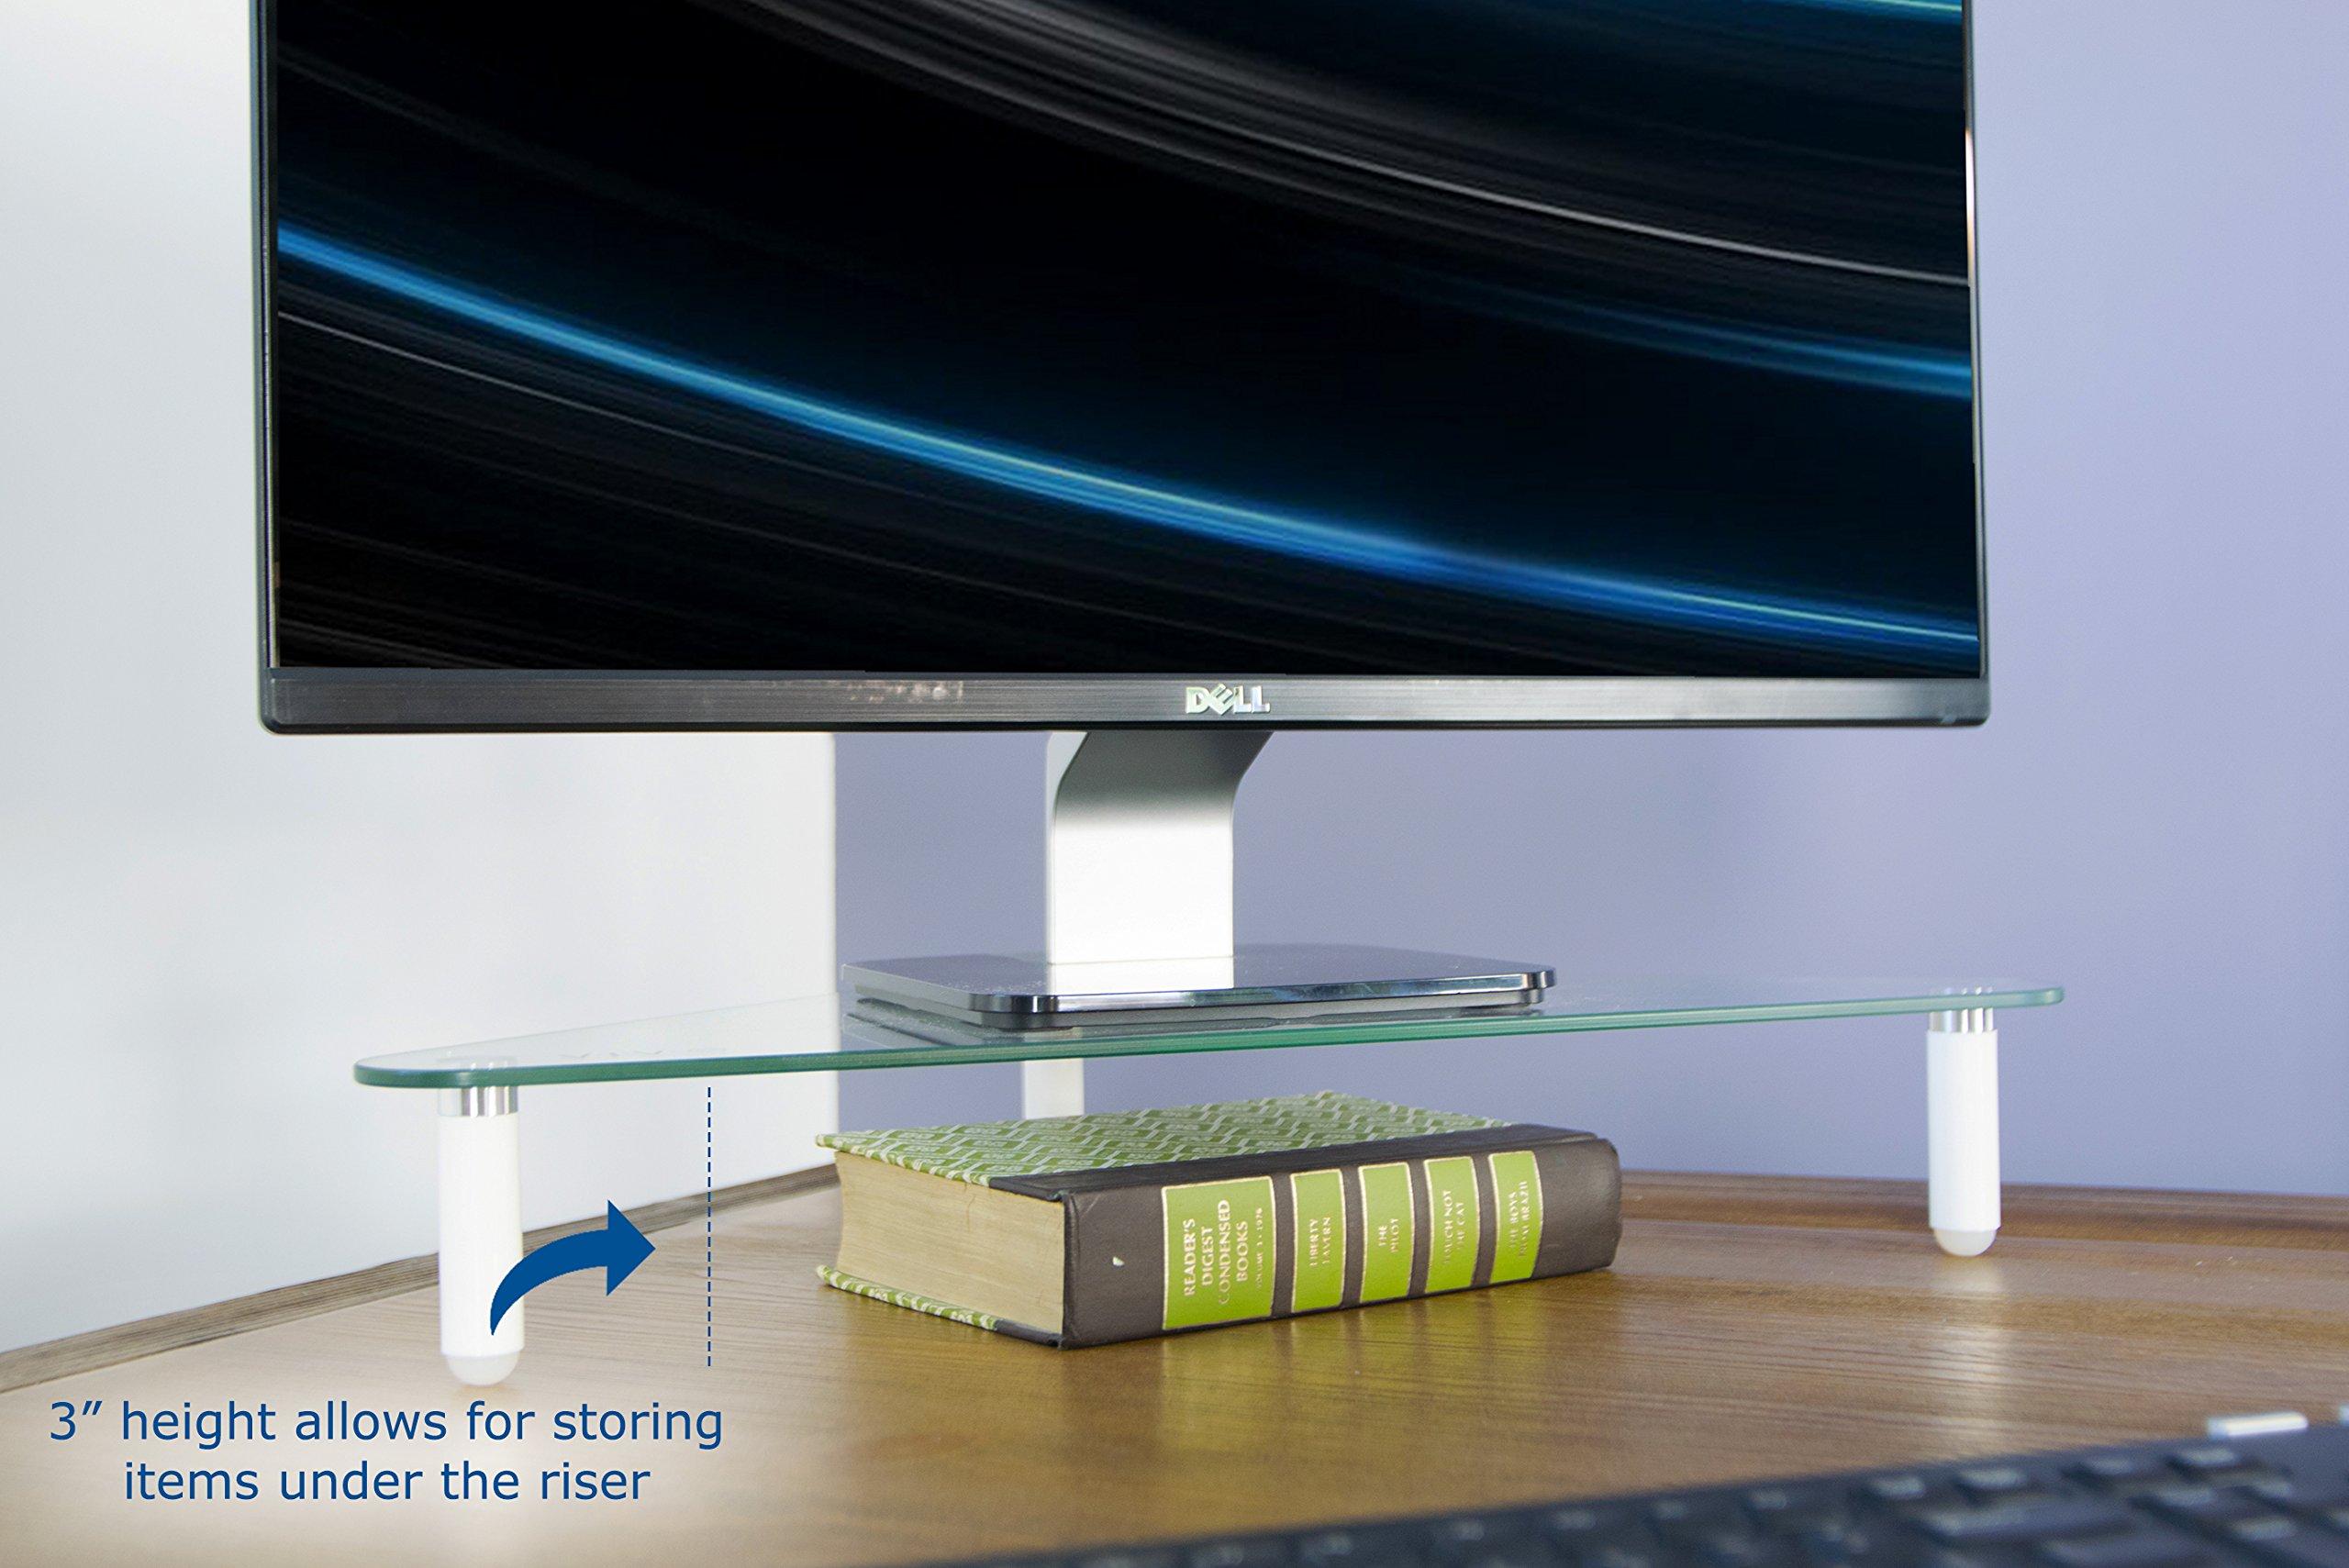 VIVO Glass Ergonomic Tabletop Riser | Triangle Desktop Universal Corner Stand for Computer Monitor & Laptop (STAND-V000Q) by VIVO (Image #5)